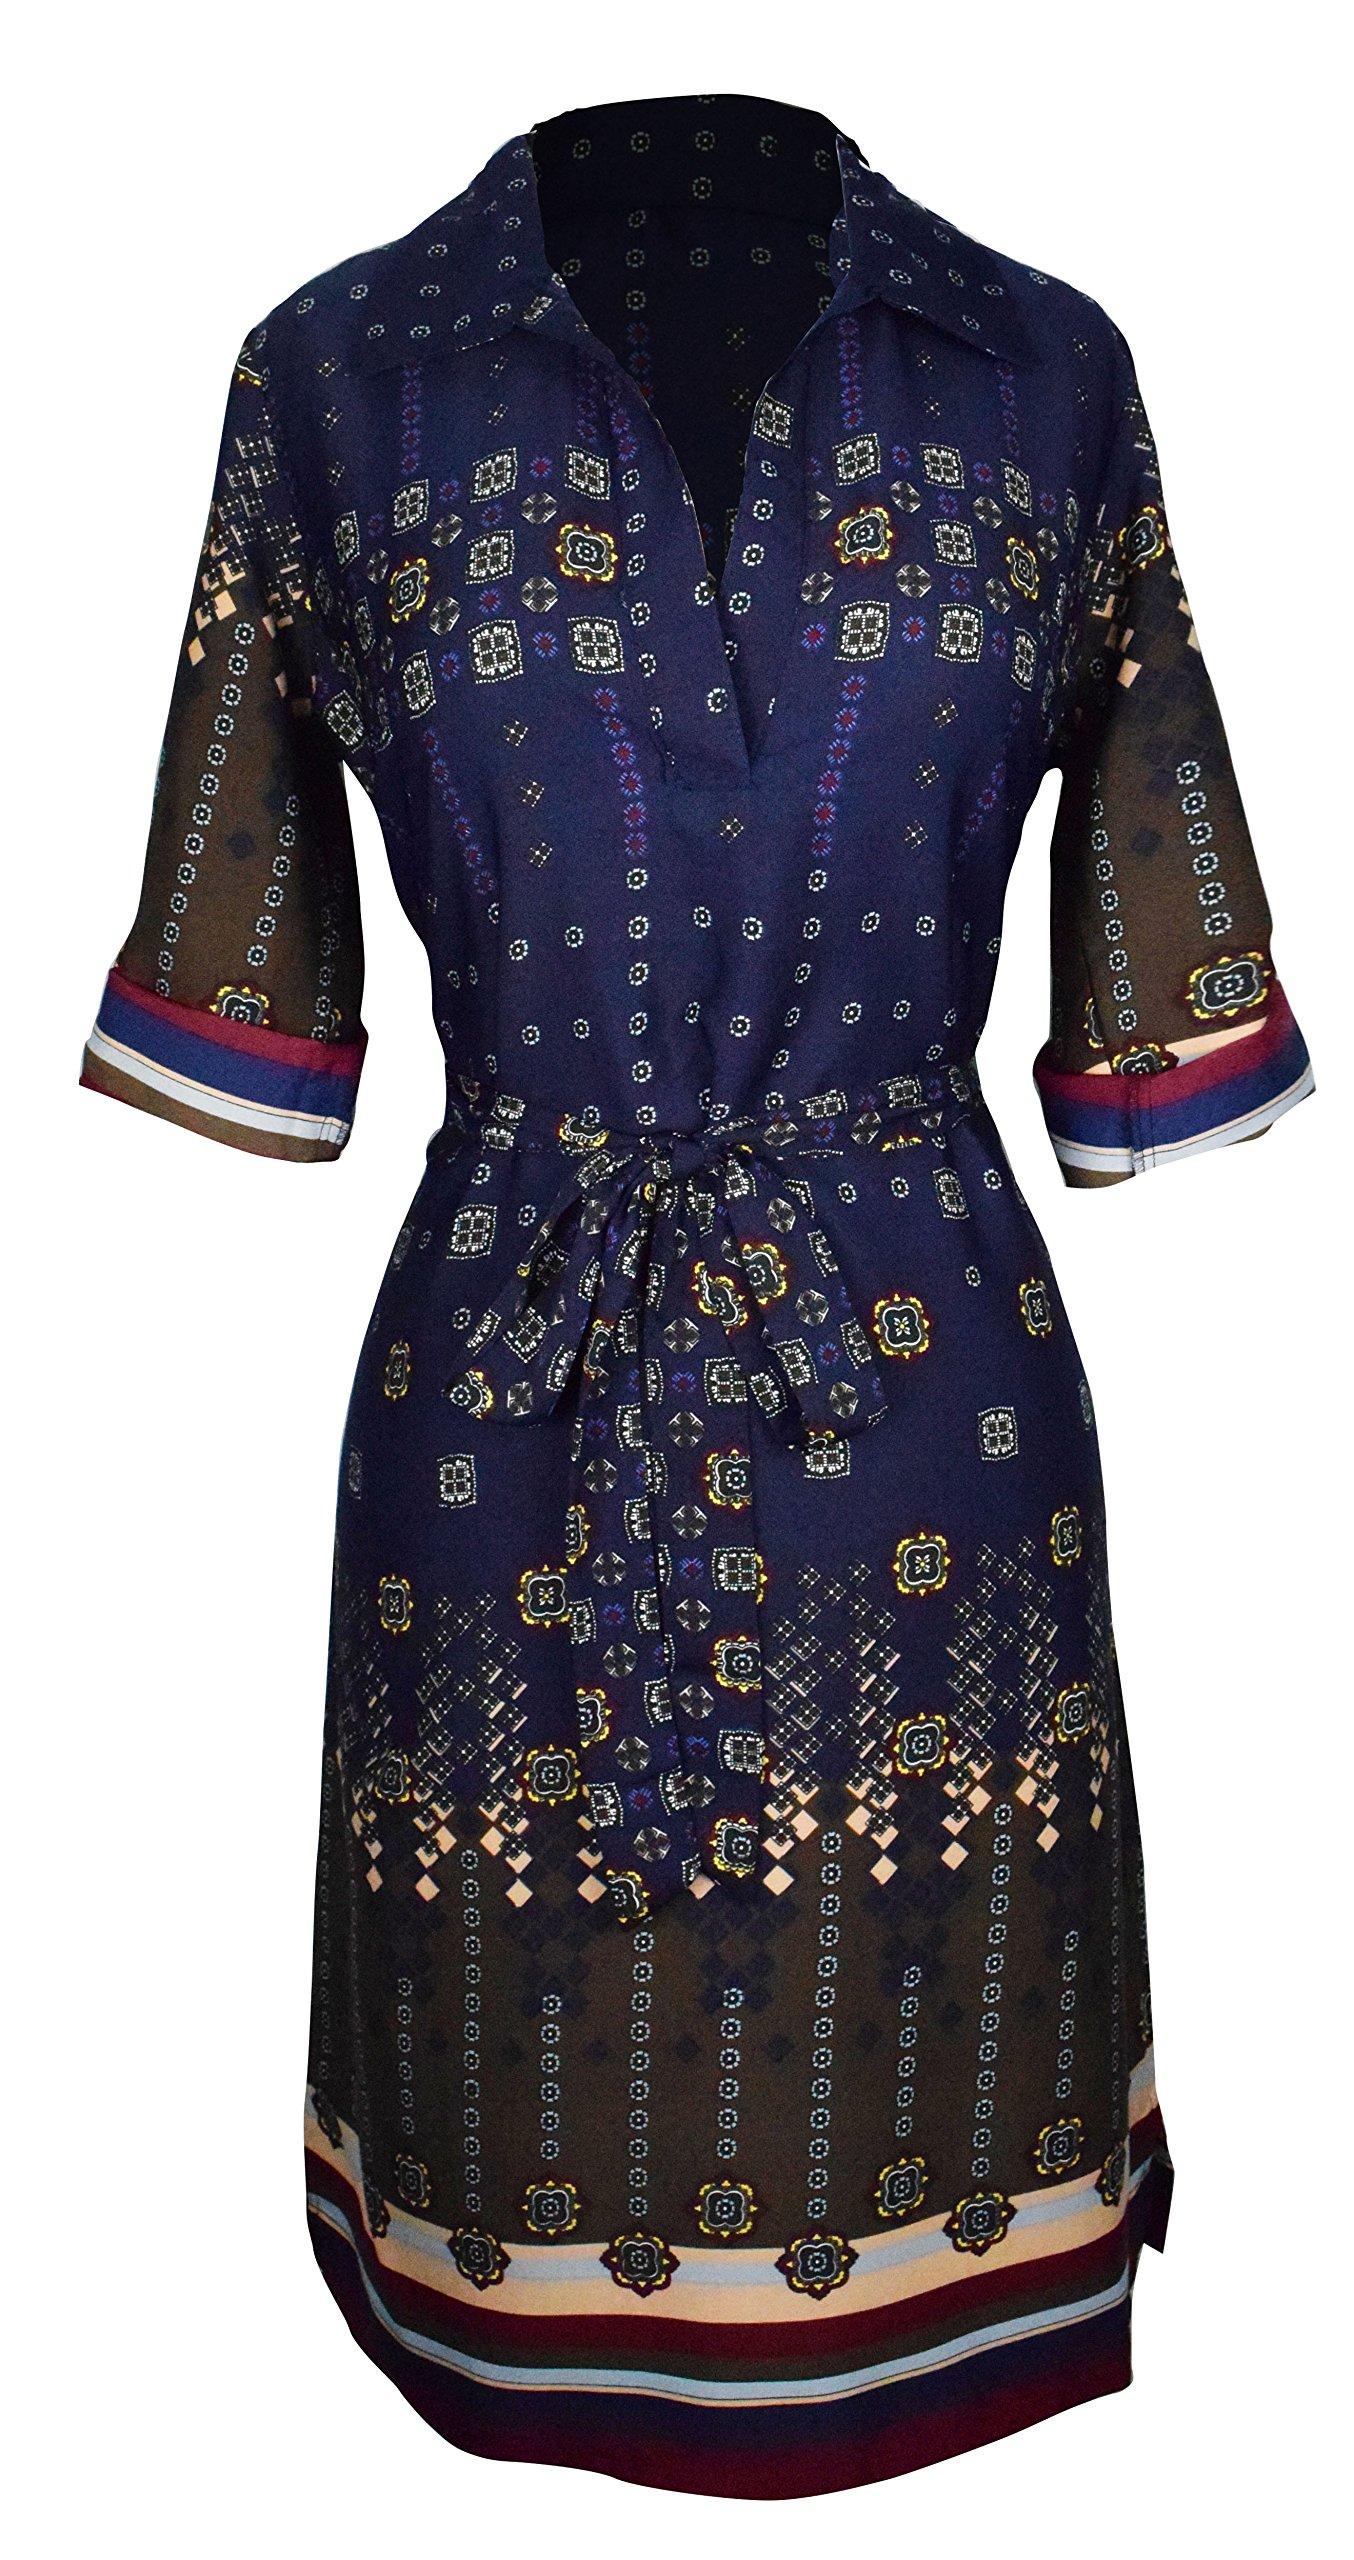 Peach Couture Womens Multi Pattern V Neck Shift ¾ Sleeve Waist Tie Shift Dress Medium Navy Maroon